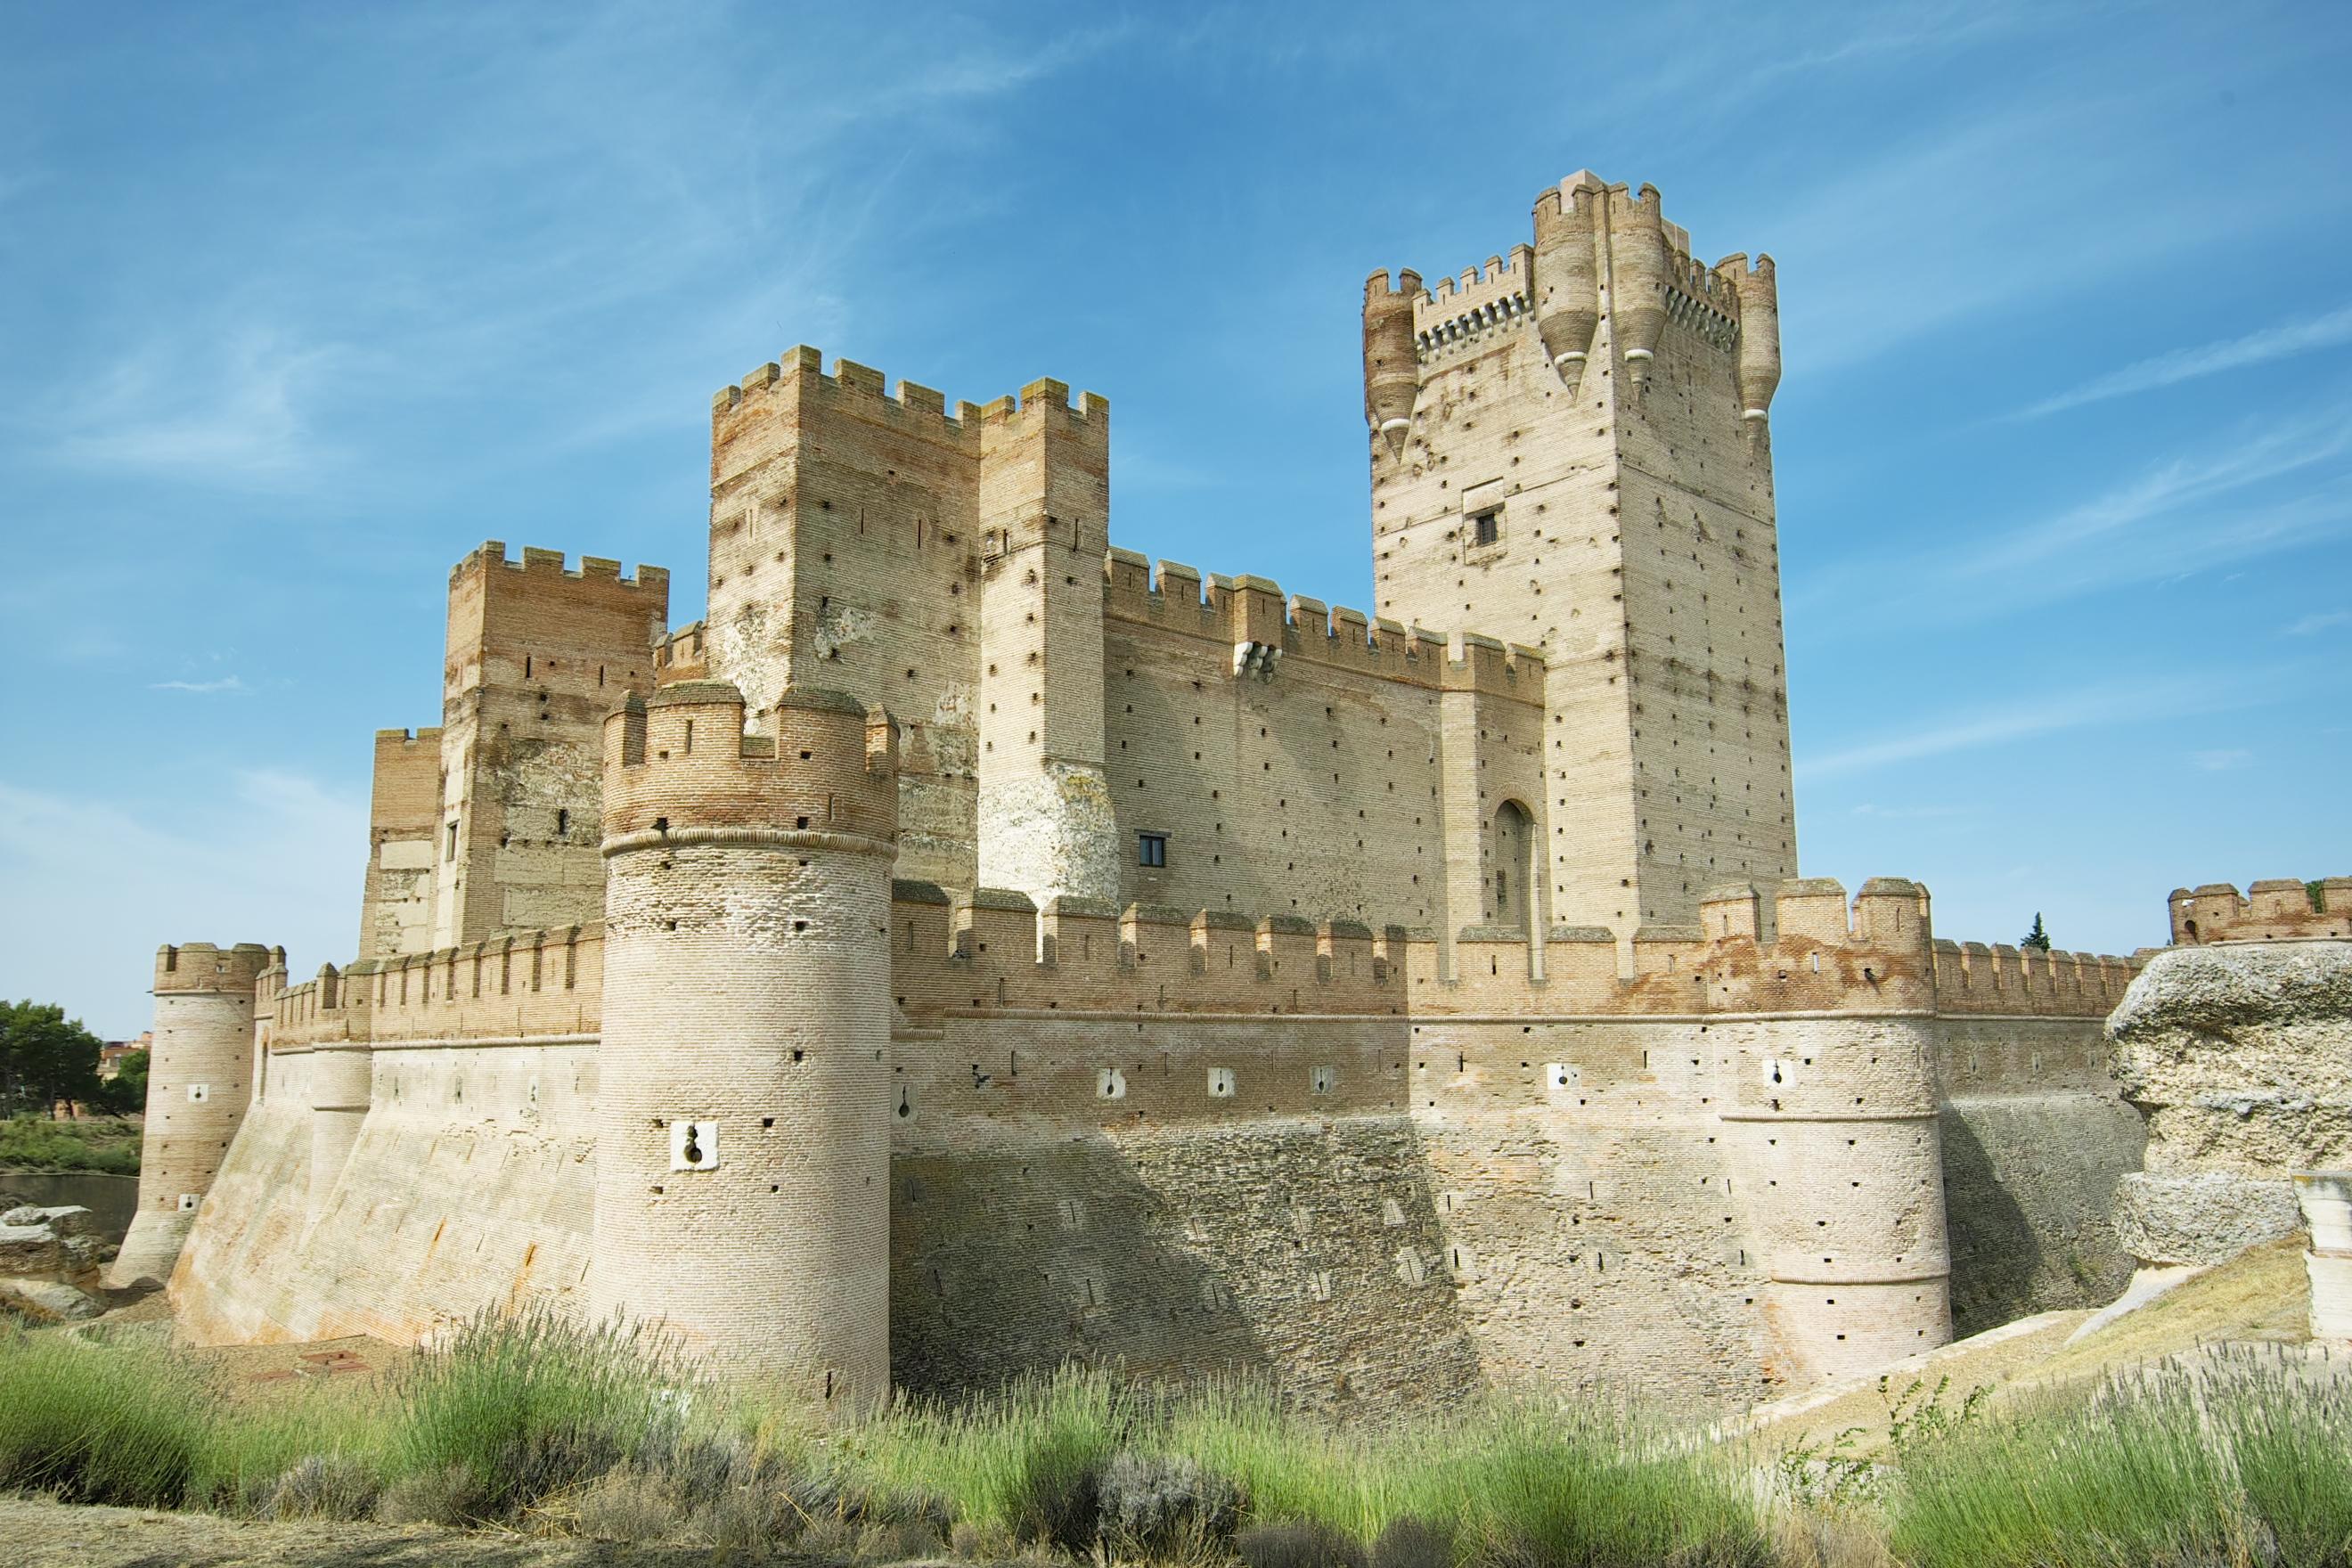 Fotos de leopoldo castillo